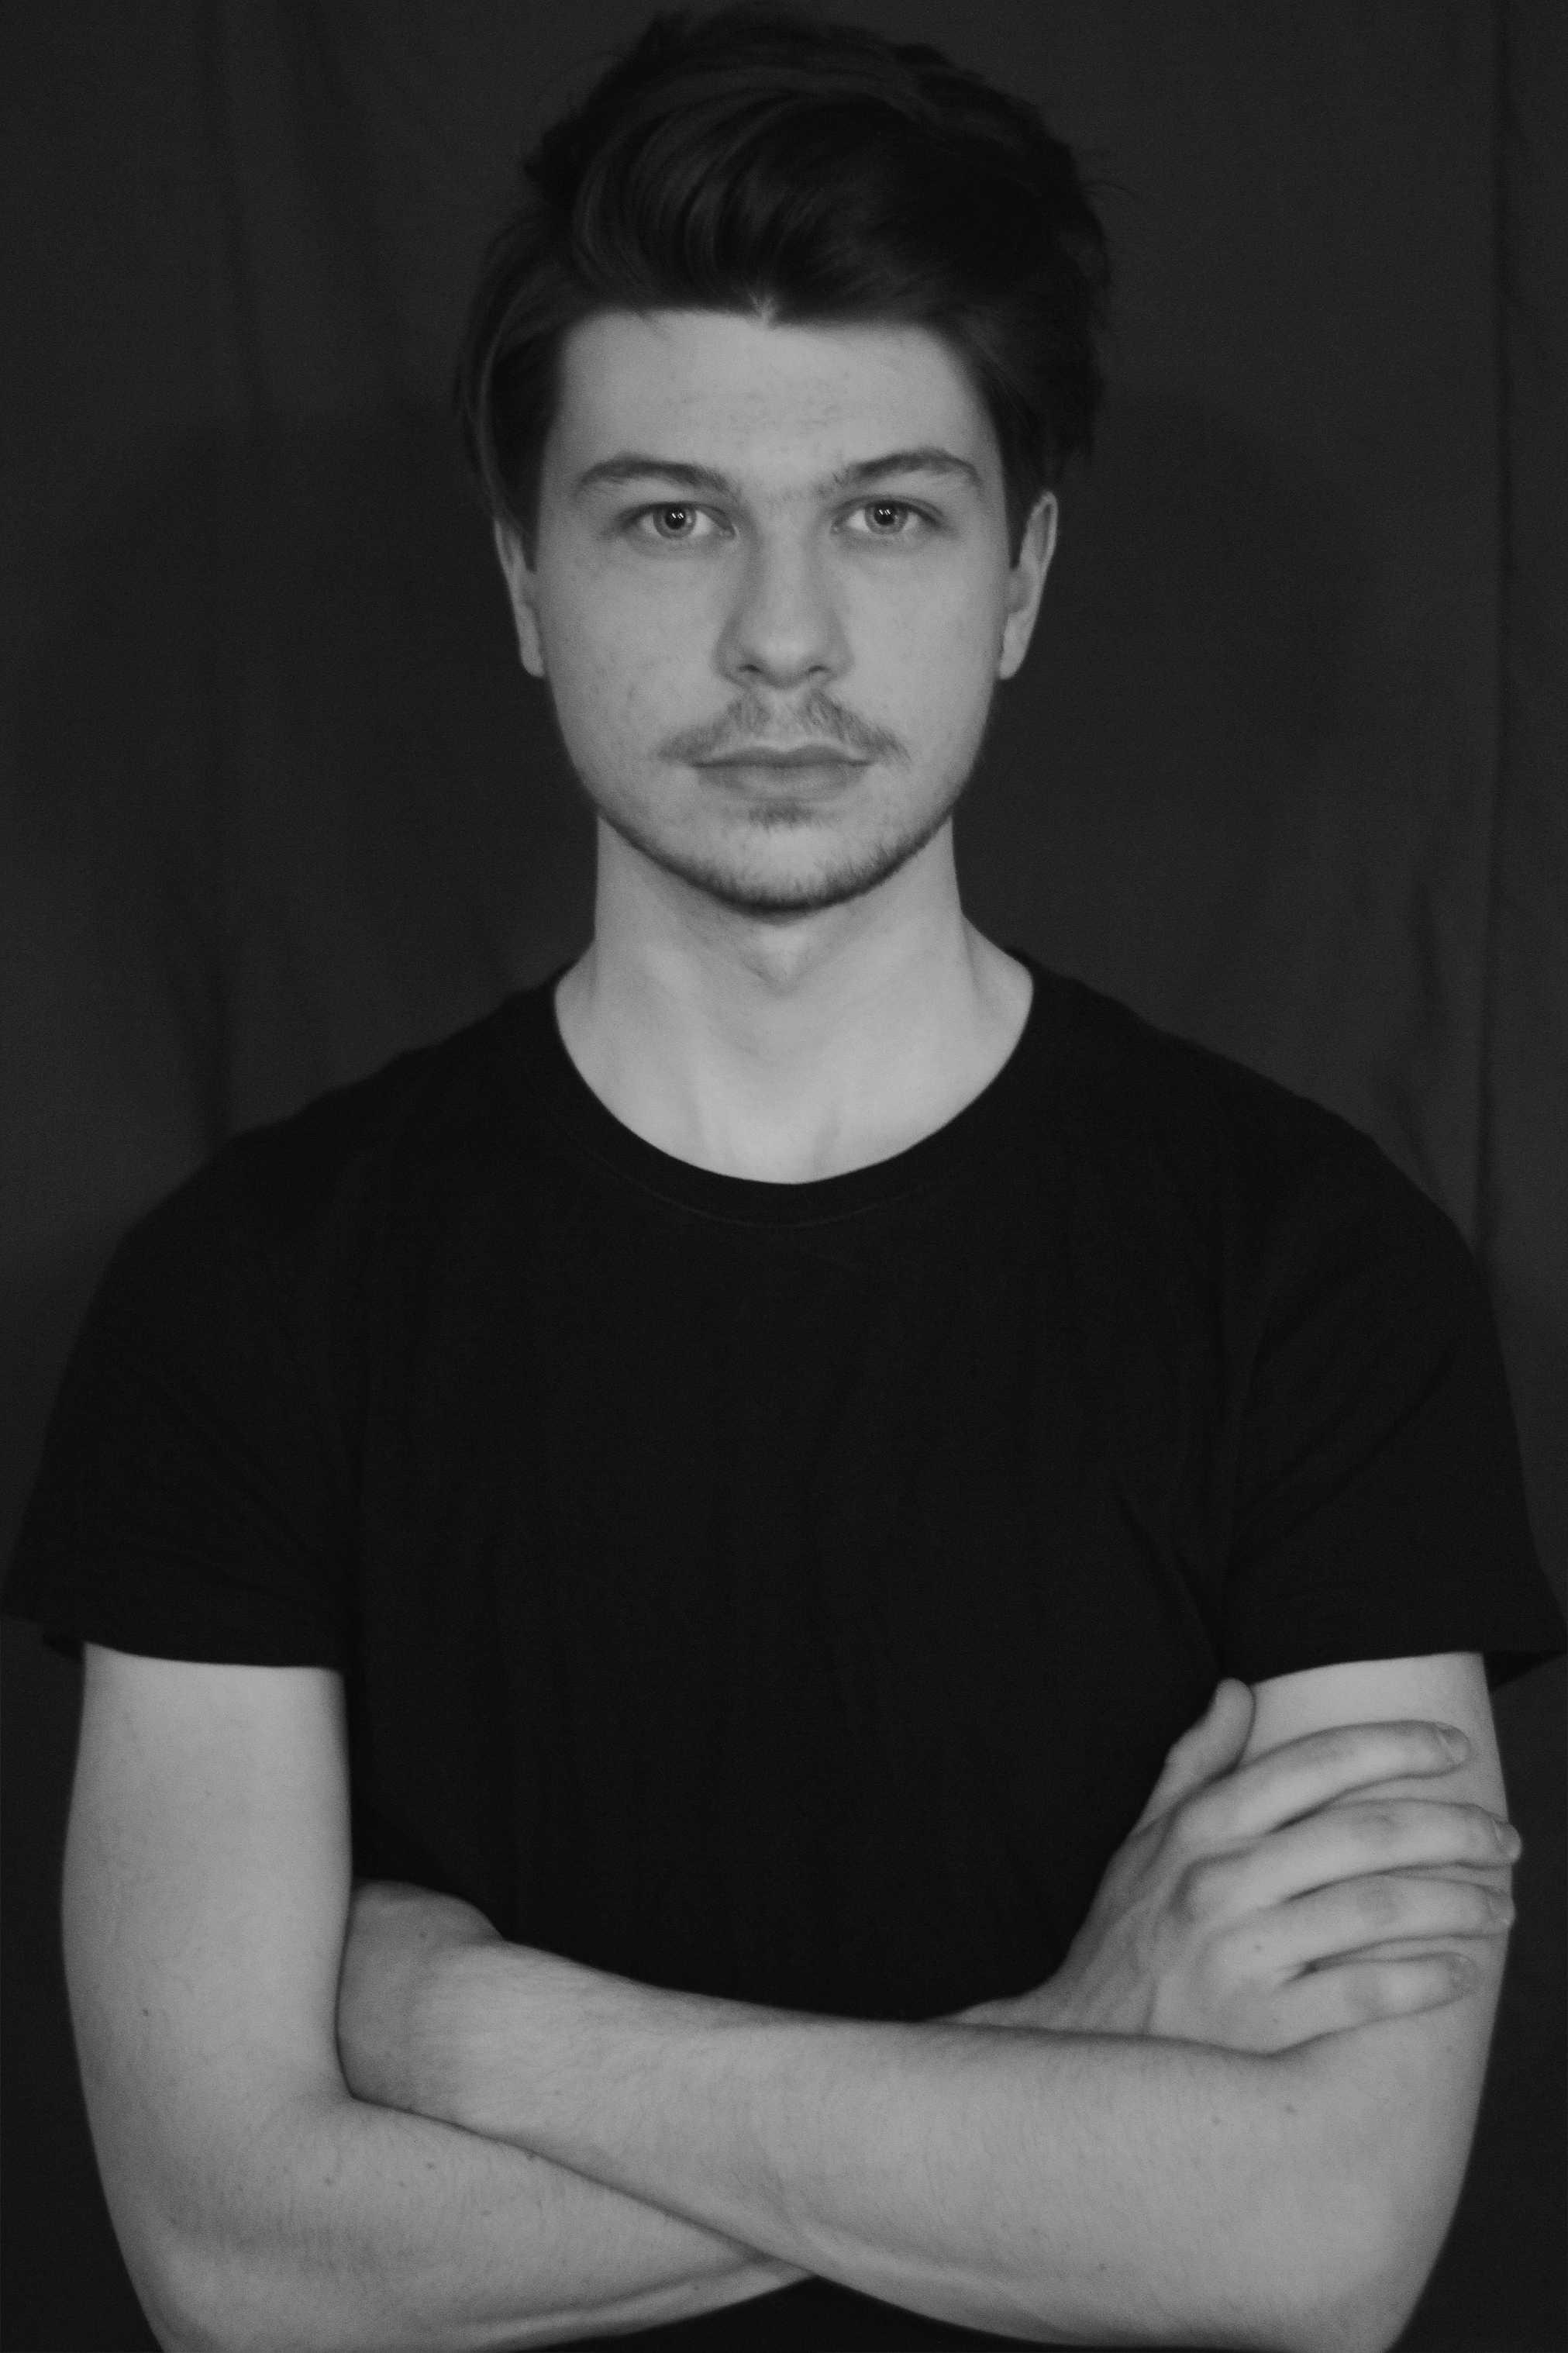 Josh Molyneux, Film Composer and Film & Television Production Advanced Diploma Program Graduate